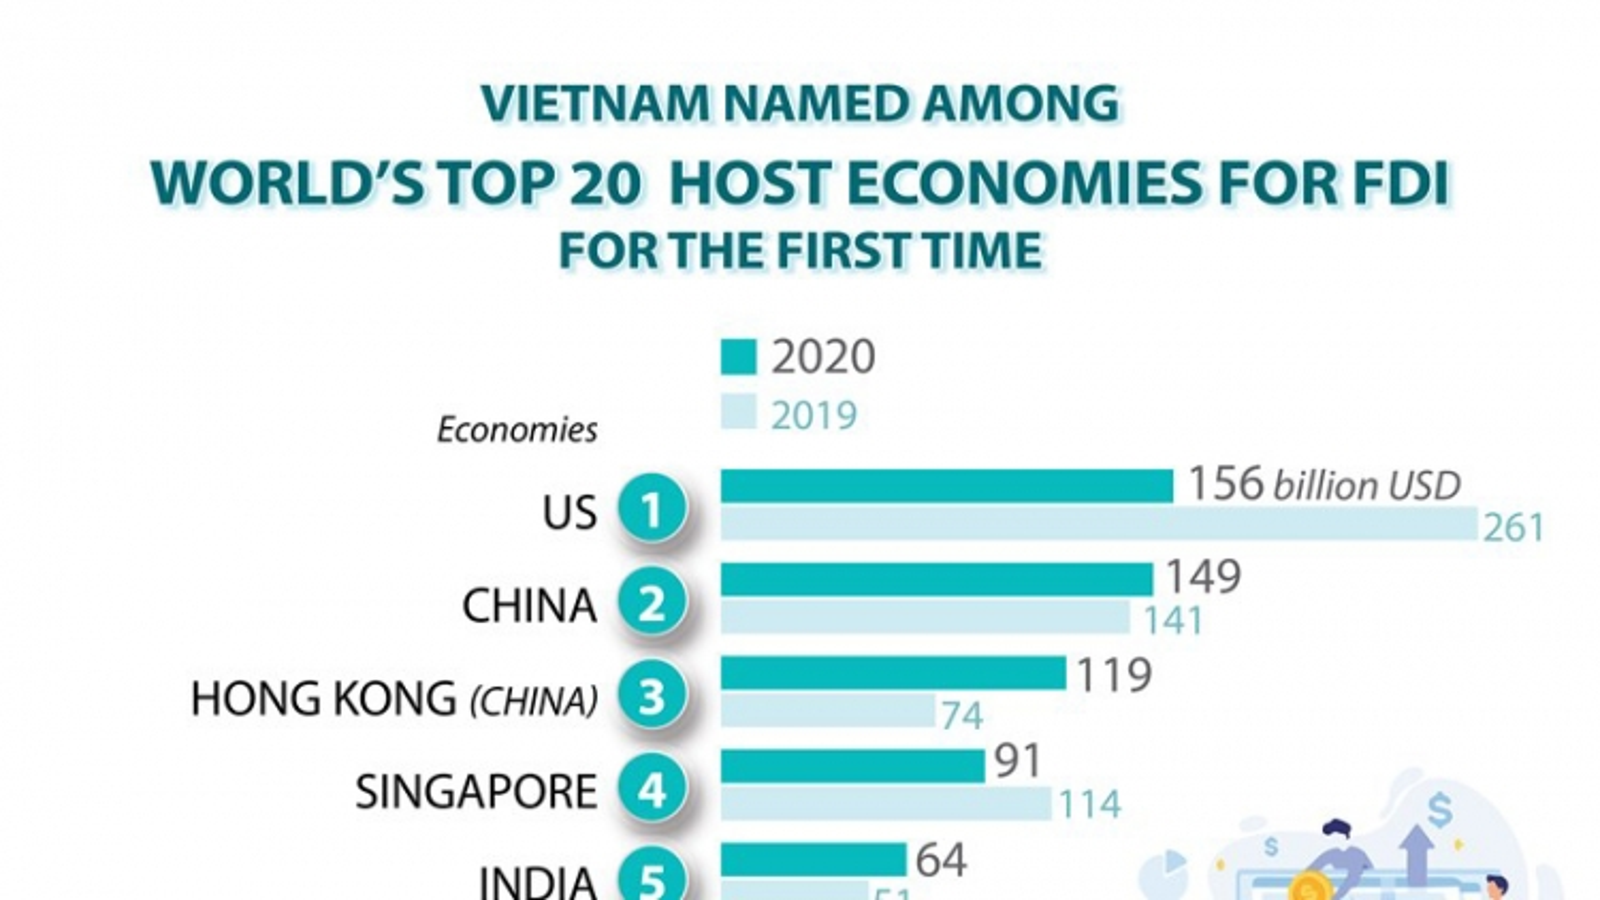 Vietnam among world's top 20 host economies for FDI